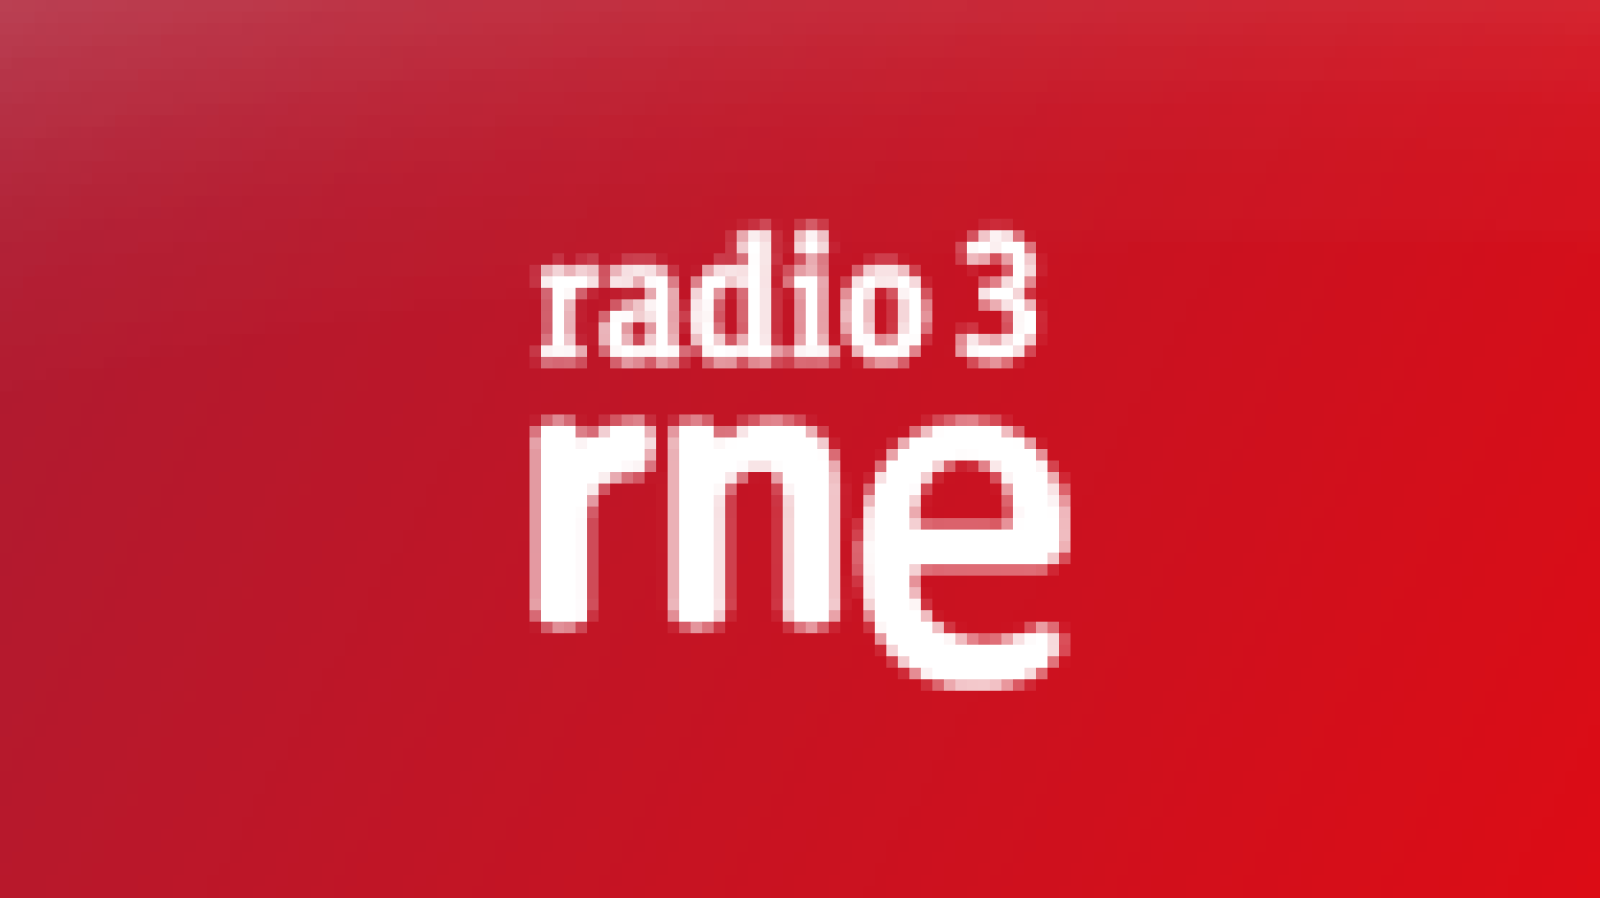 Carne cruda - 15M: Presente! - 21/11/11 - Escuchar ahora